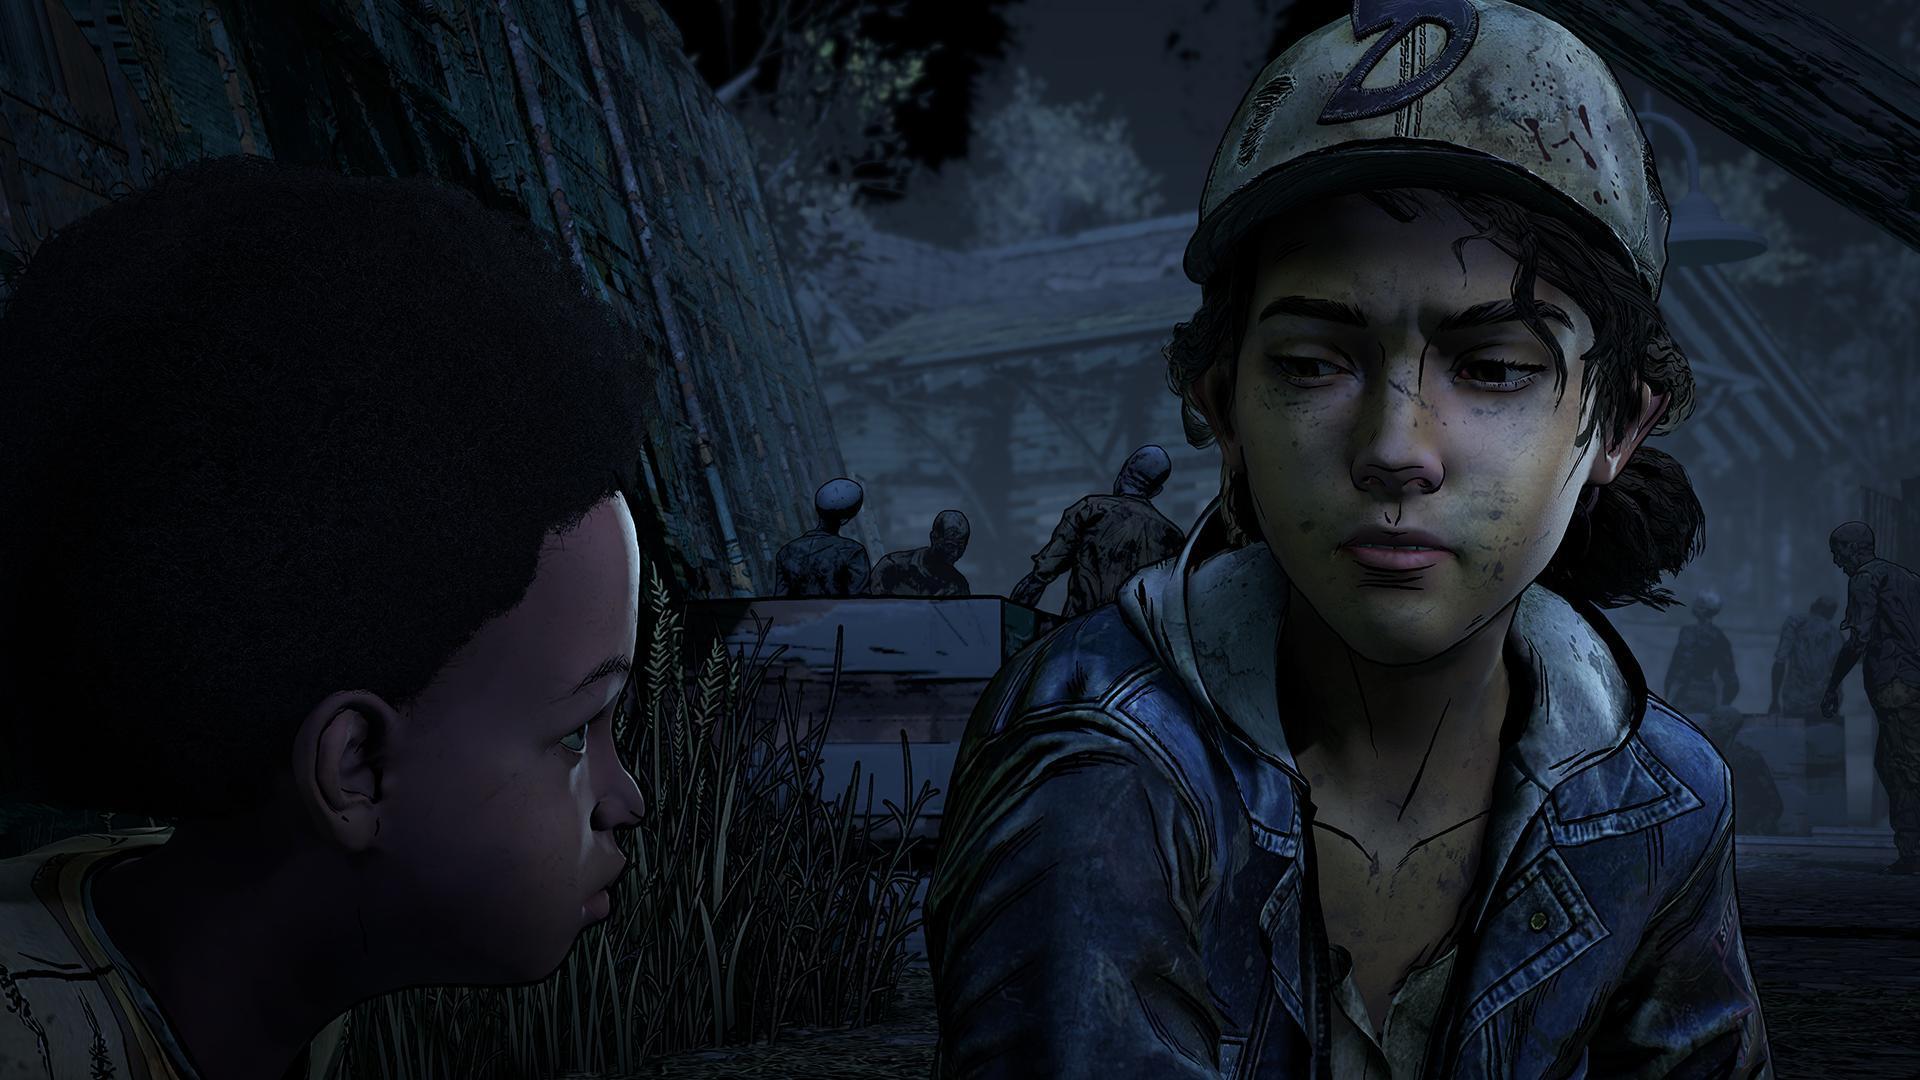 The Walking Dead: The Final Season - Episode 1 (2018/PC/Русский), RePack от xatab